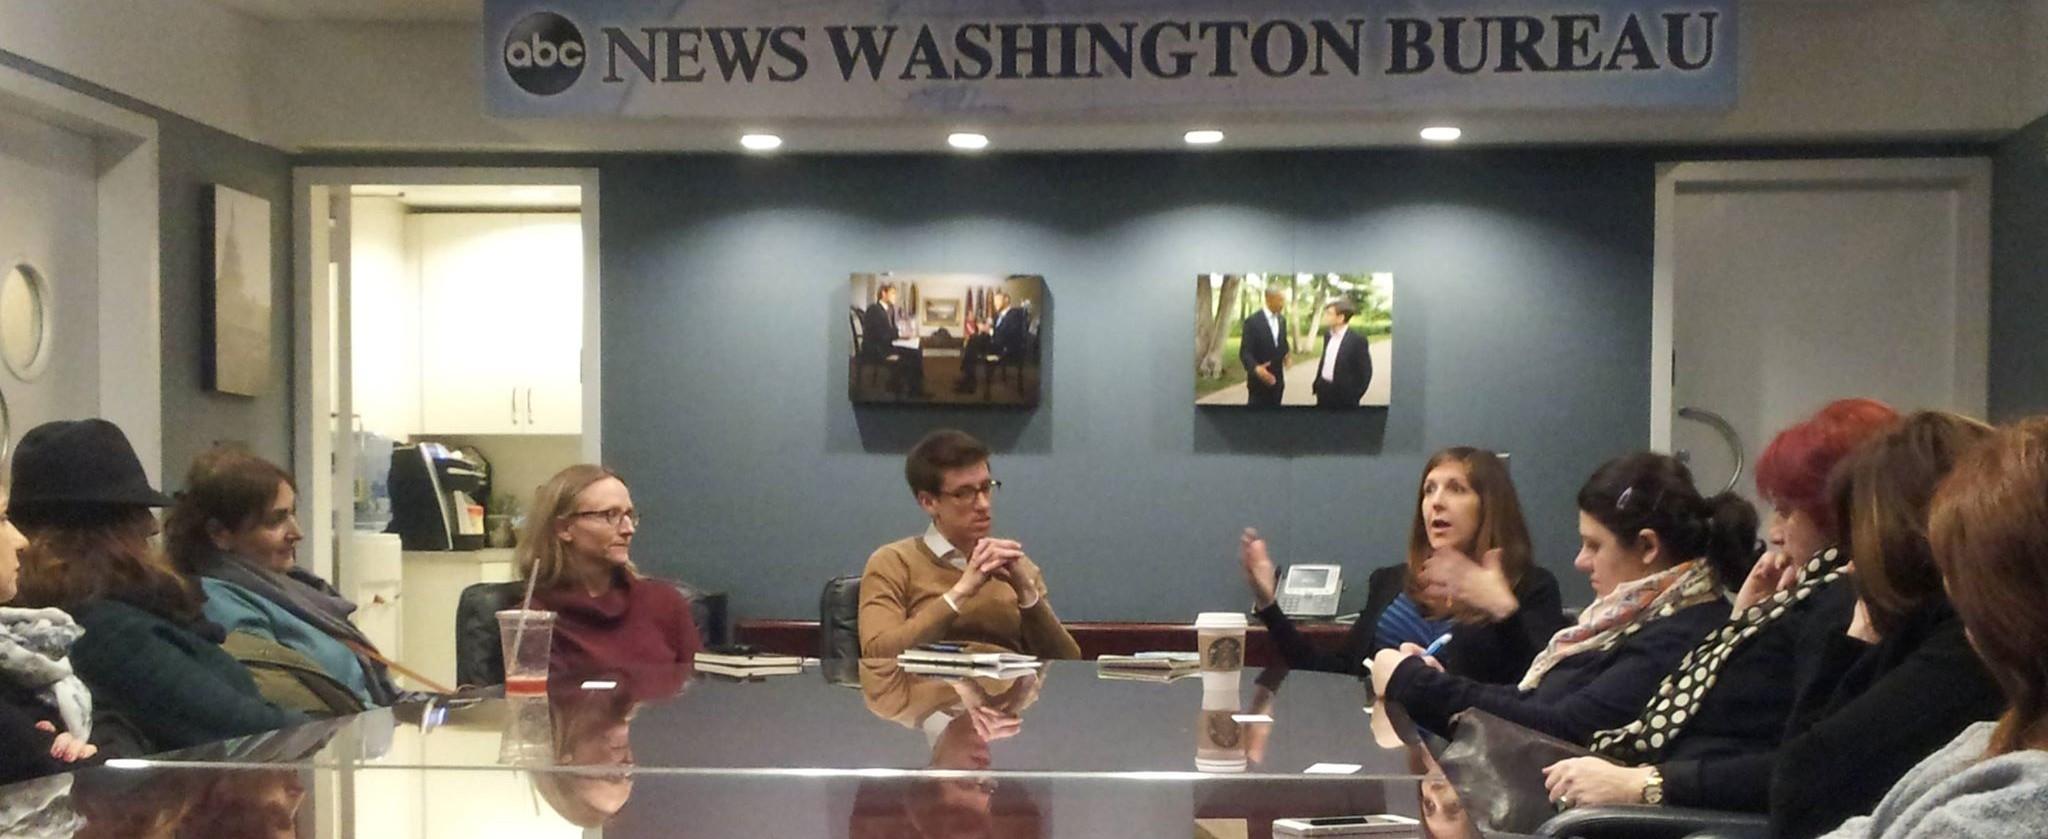 ABC News Washington Bureau